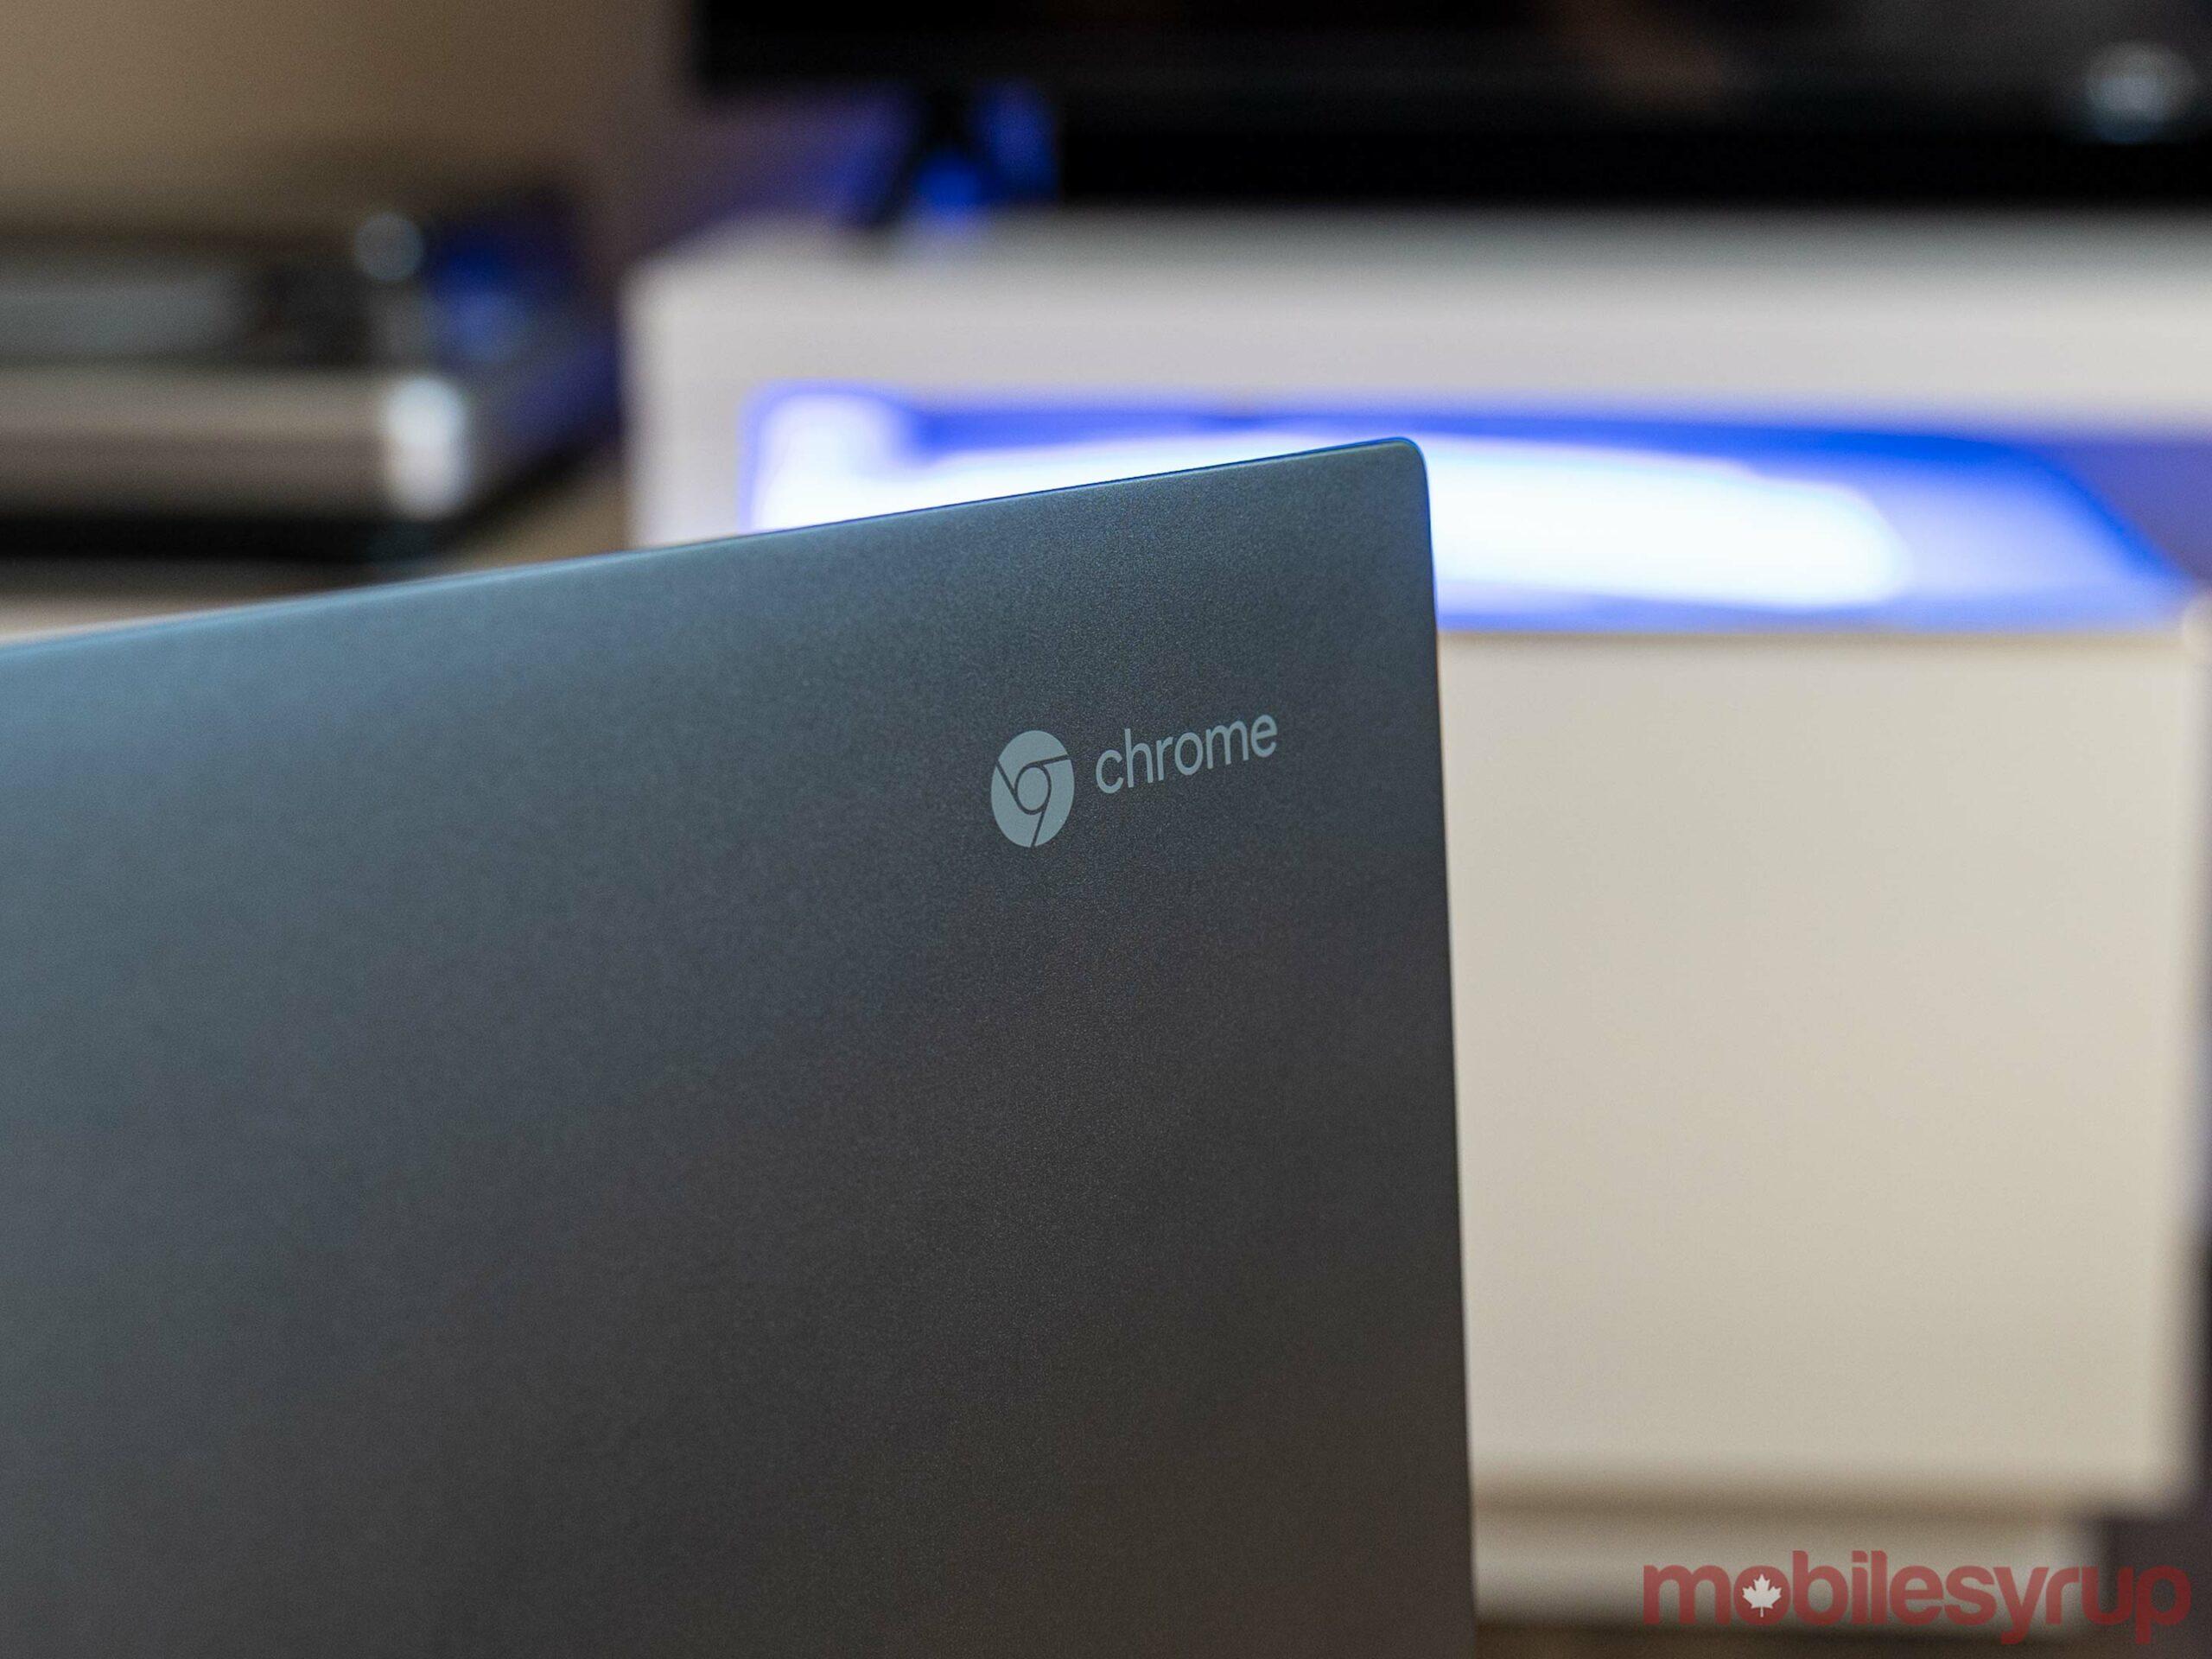 Lenovo ThinkPad C13 Yoga Gen 1 Chrome OS